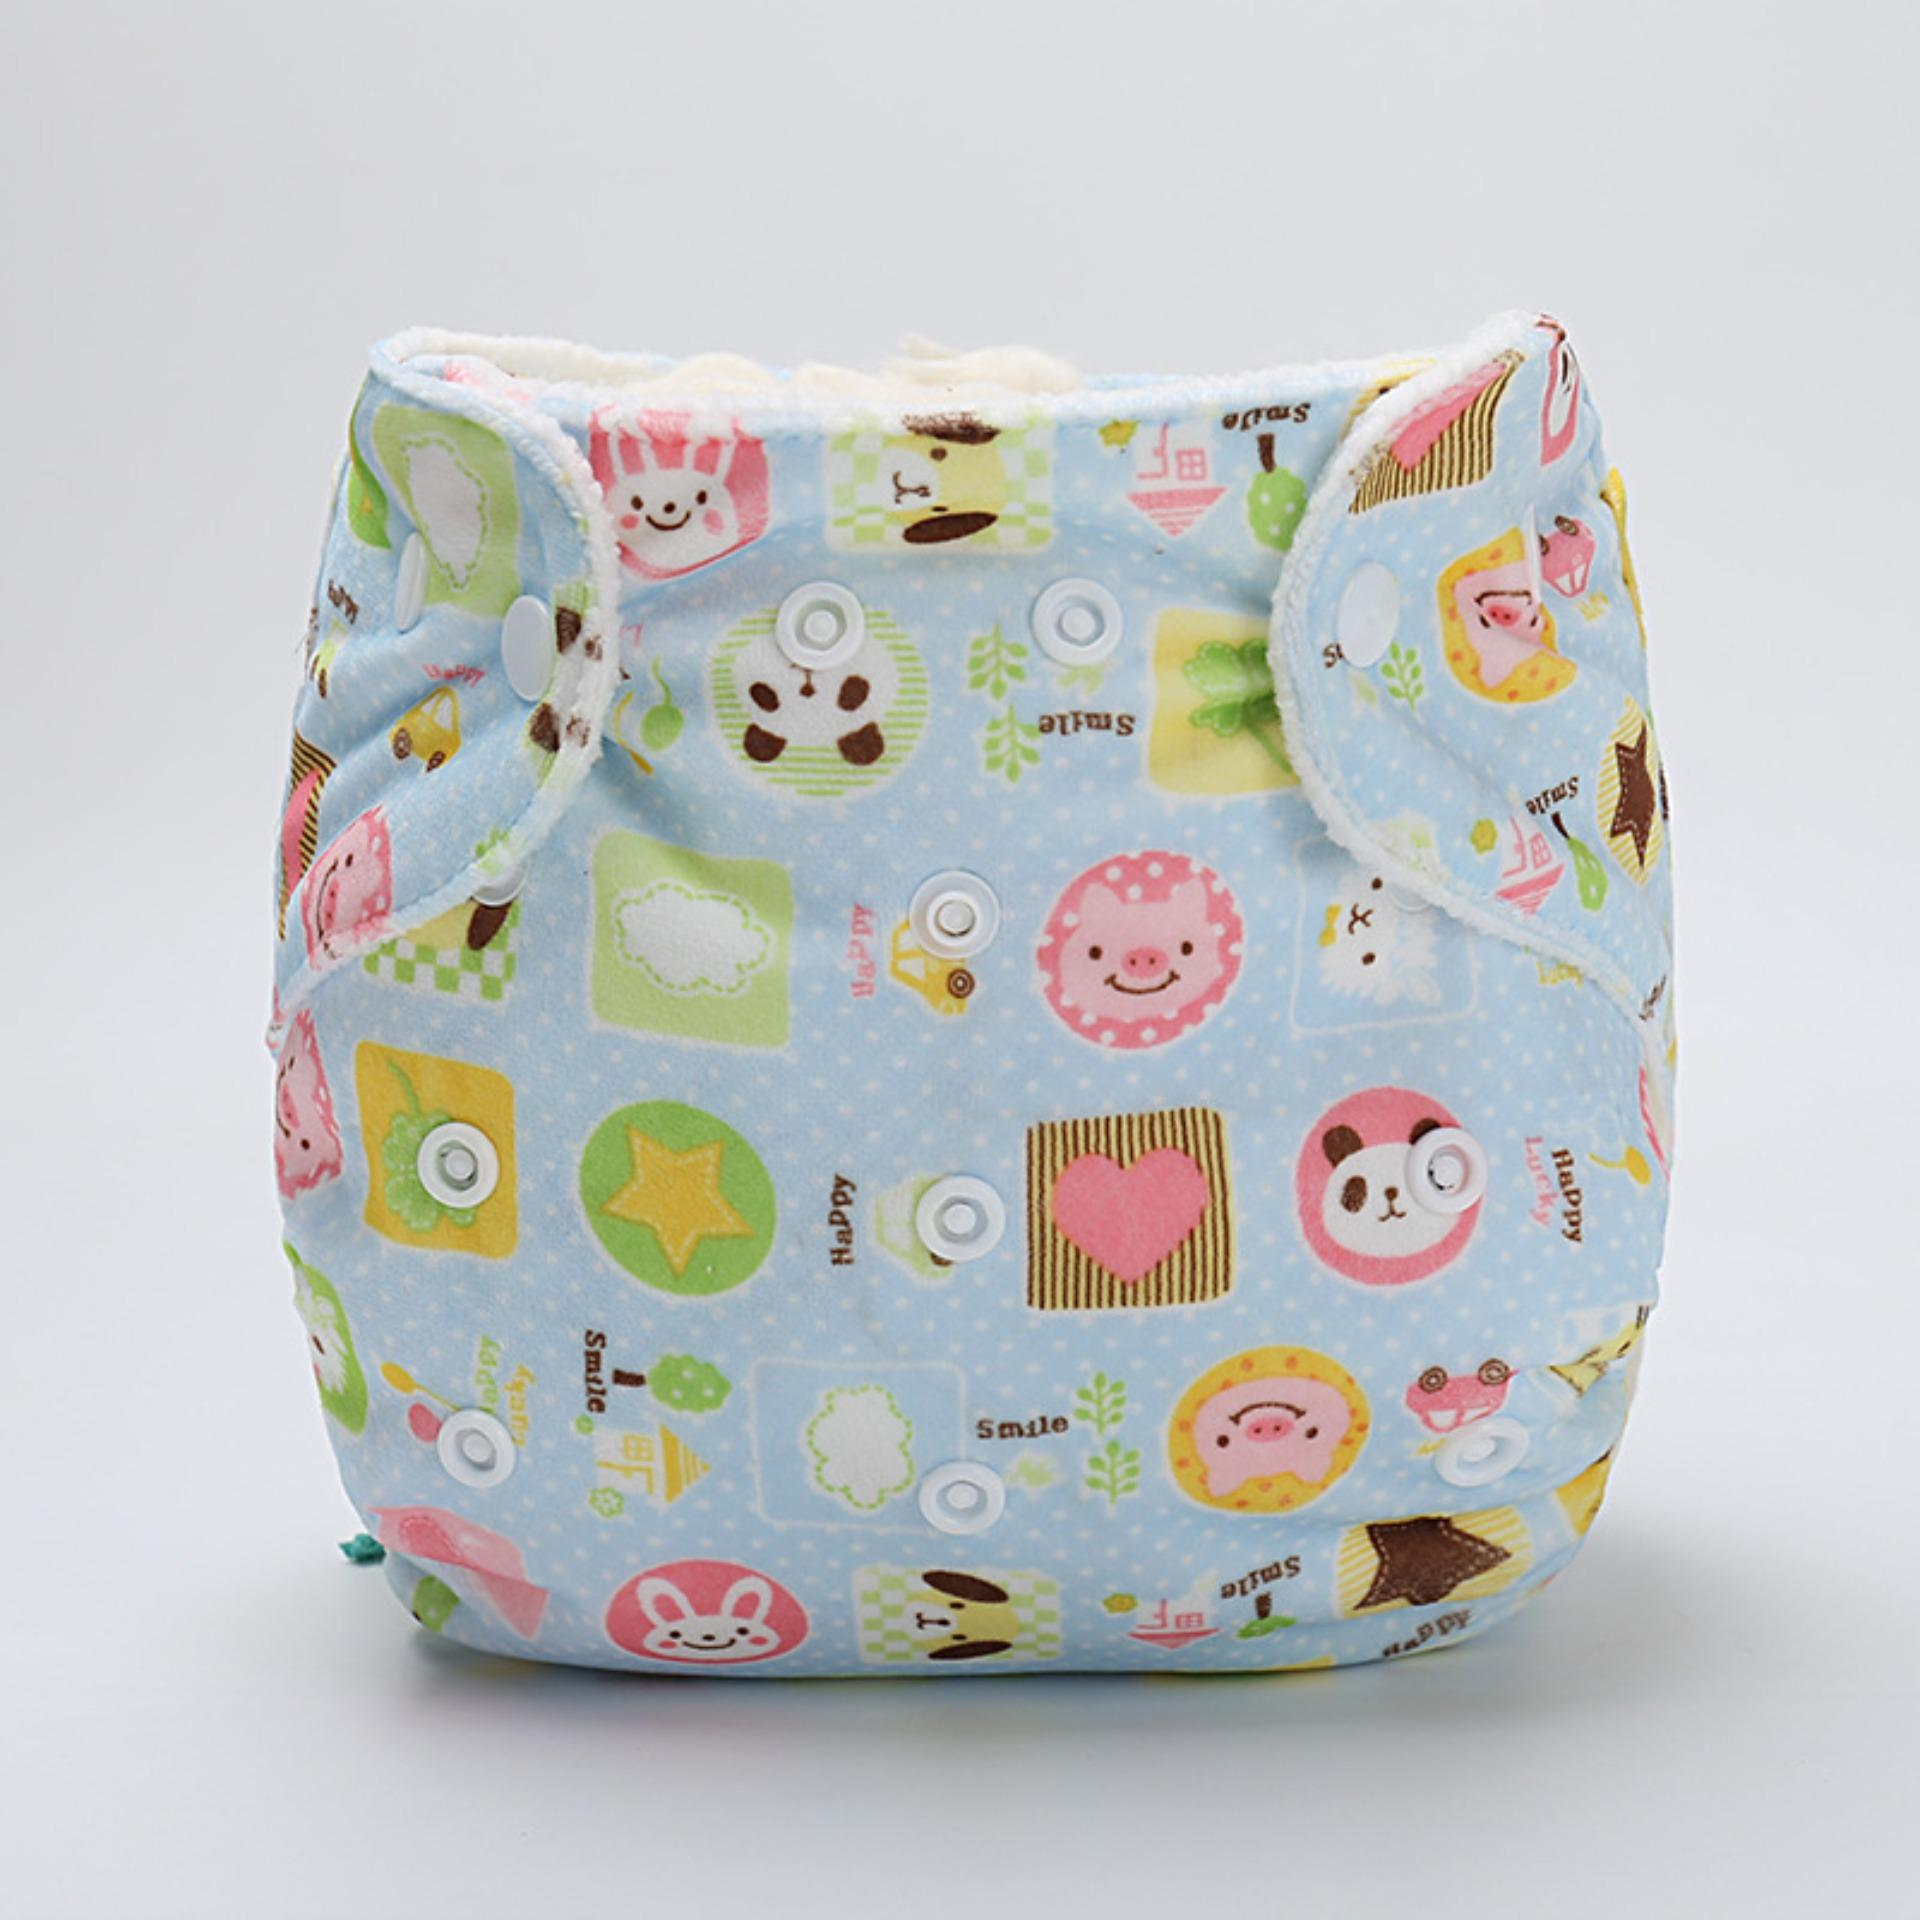 Clodi Bludru Import Naughty Baby Motif Plus Insert Microfibre Biru Popok Kain Bayi Babyland Snap Microfiber Cloth Diaper Pink Tree 1 Original